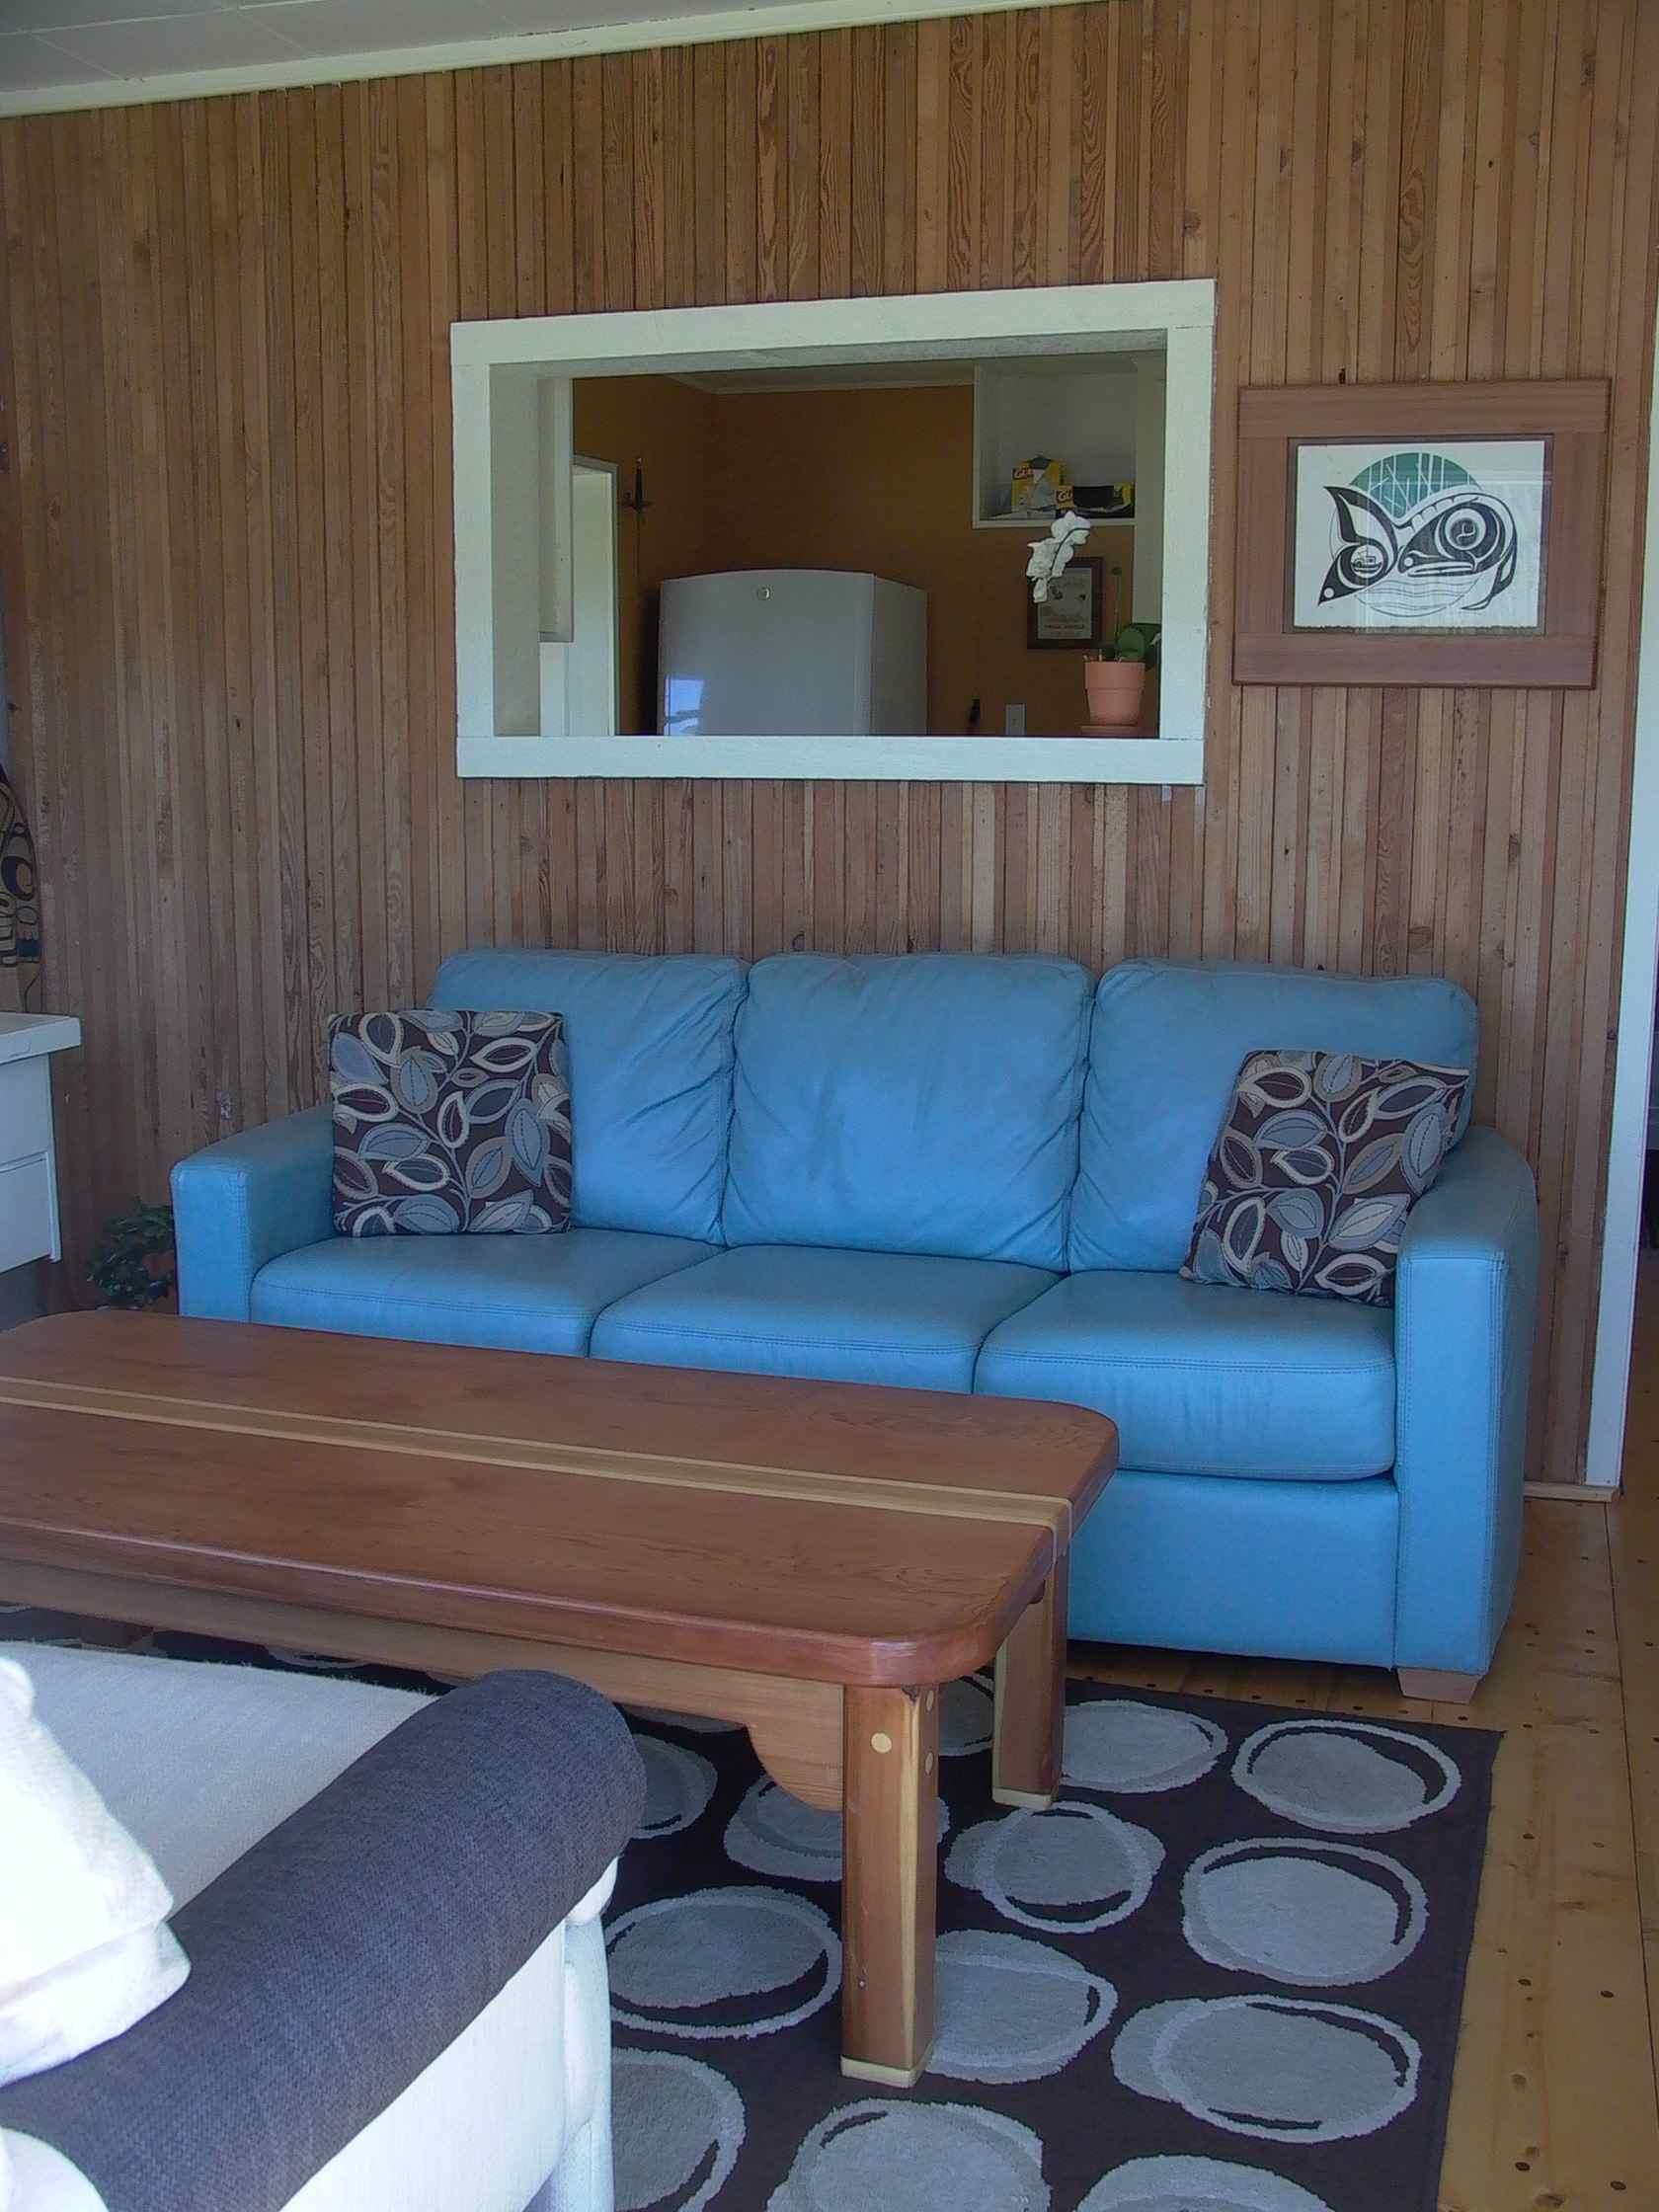 Cassiar Cannery - Sockeye House - living room kitchen side